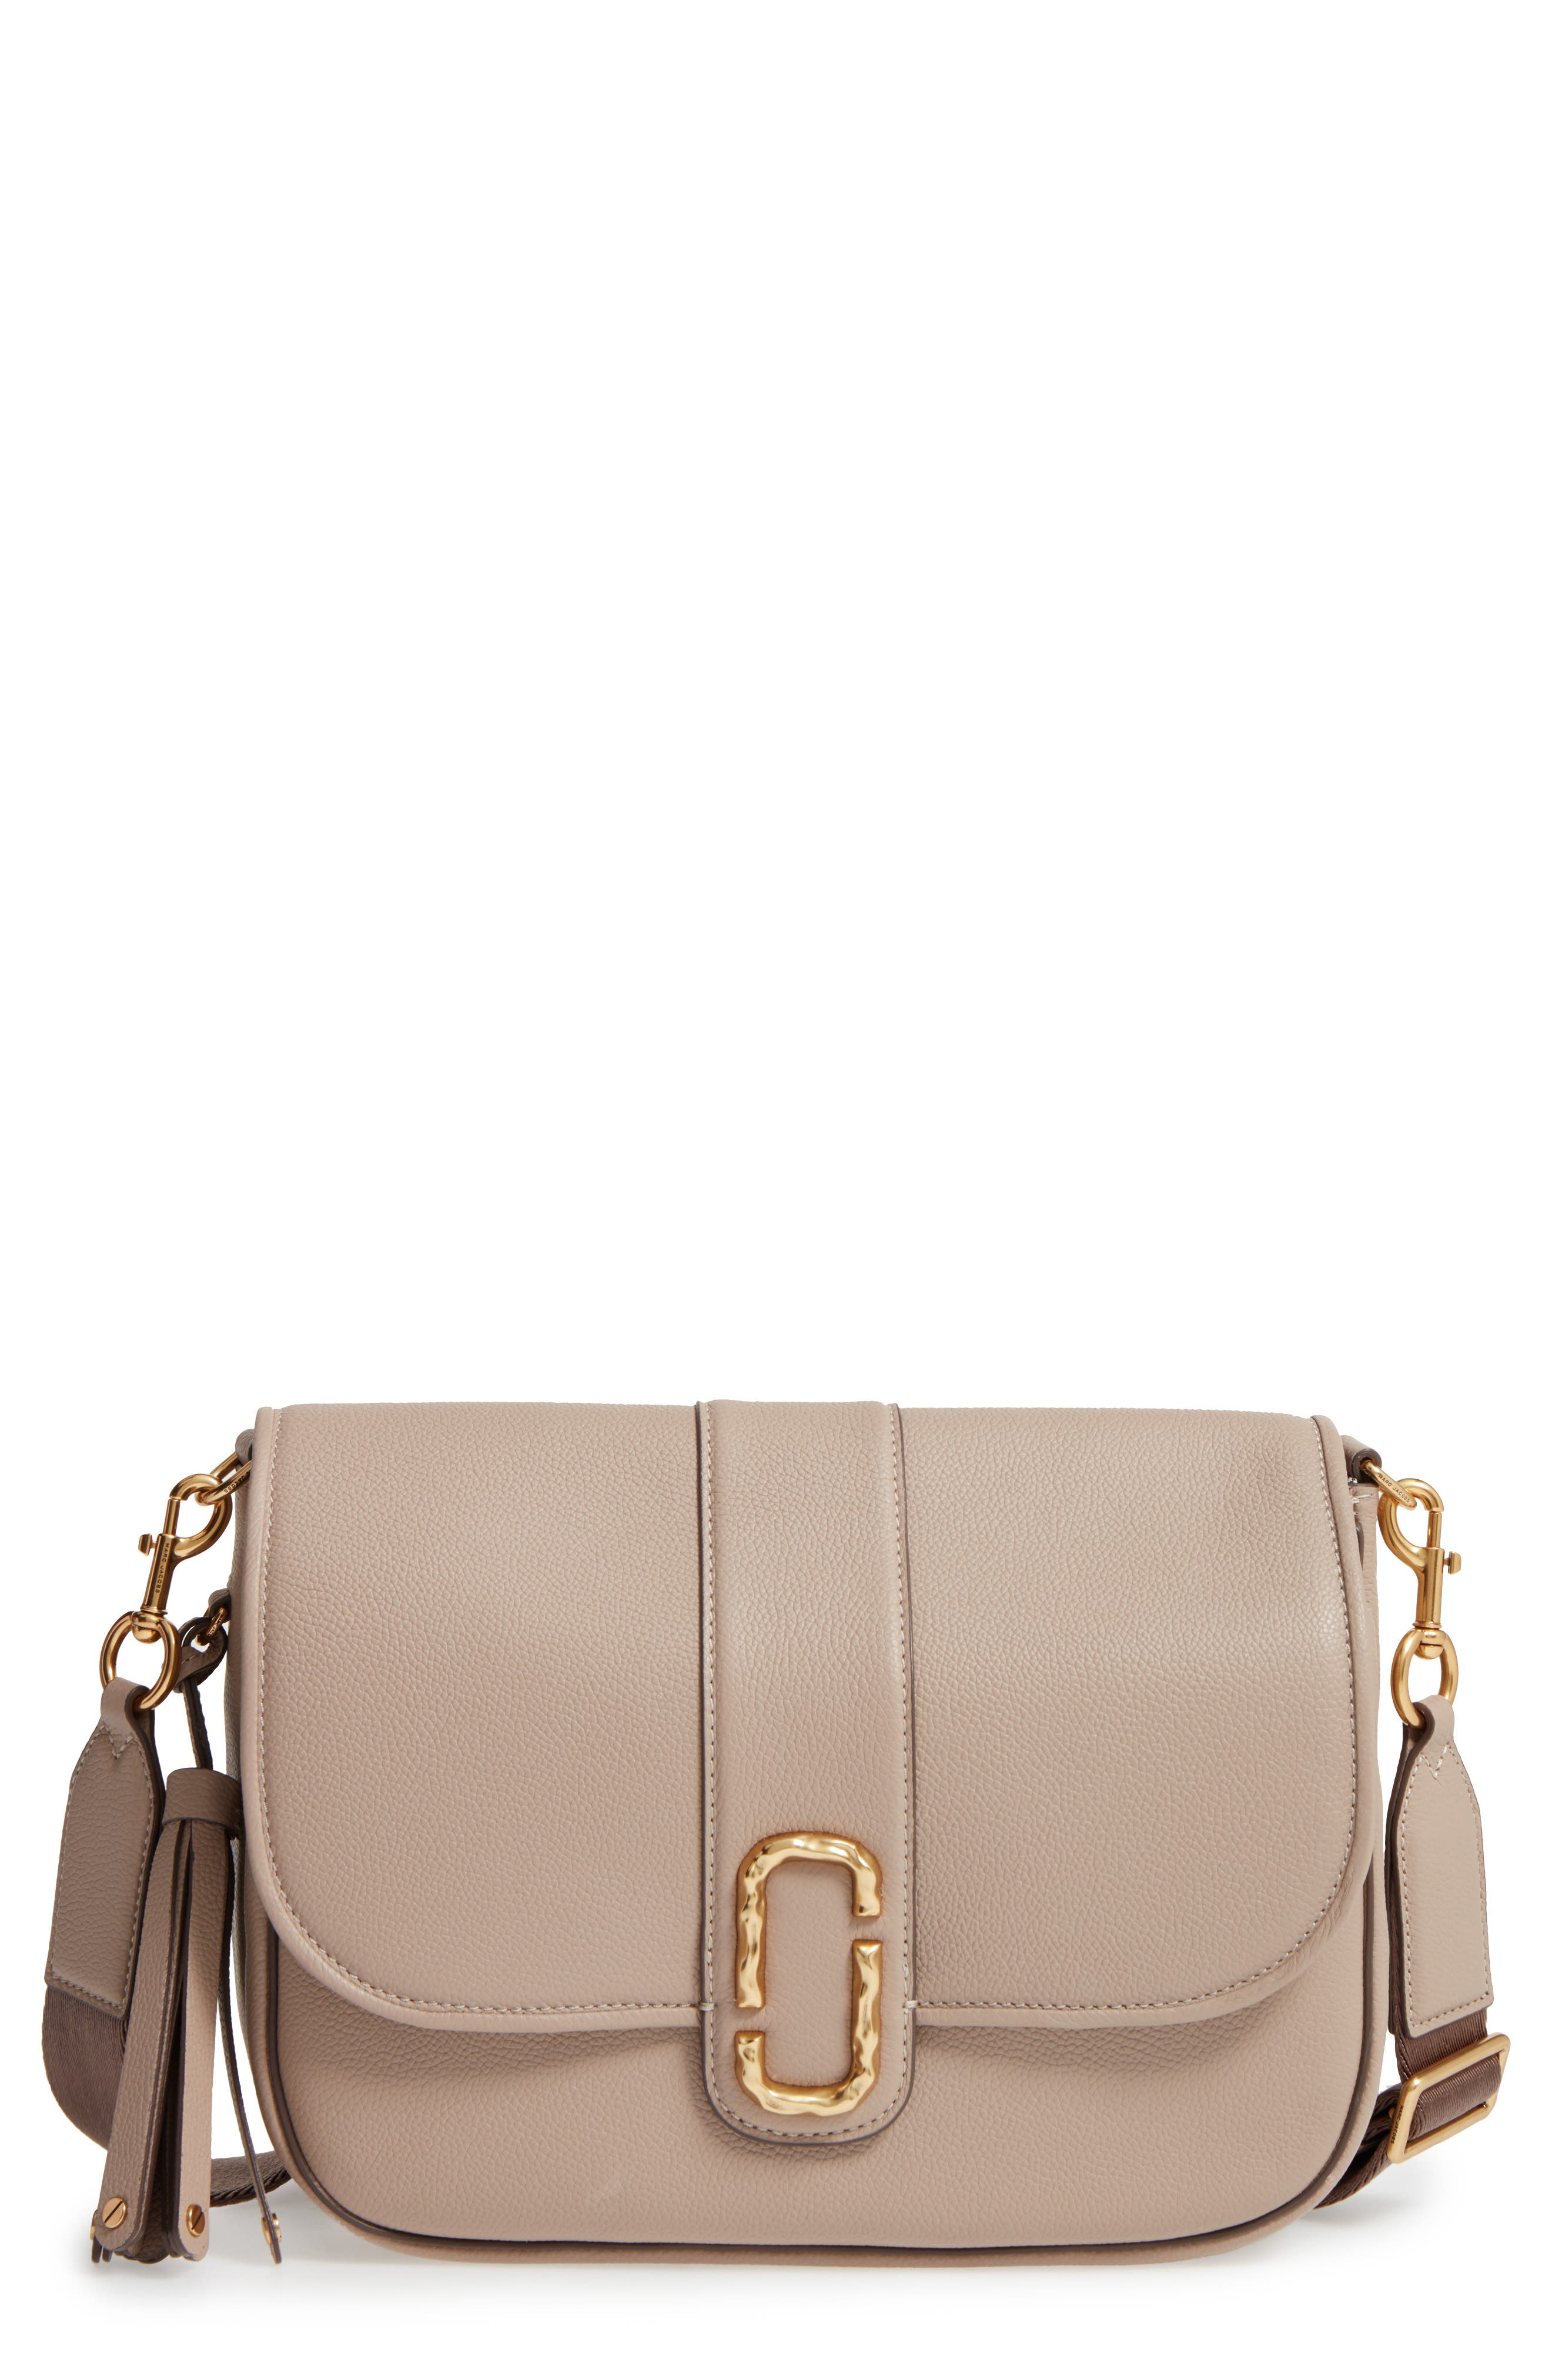 Main Image - MARC JACOBS Interlock Leather Crossbody Bag